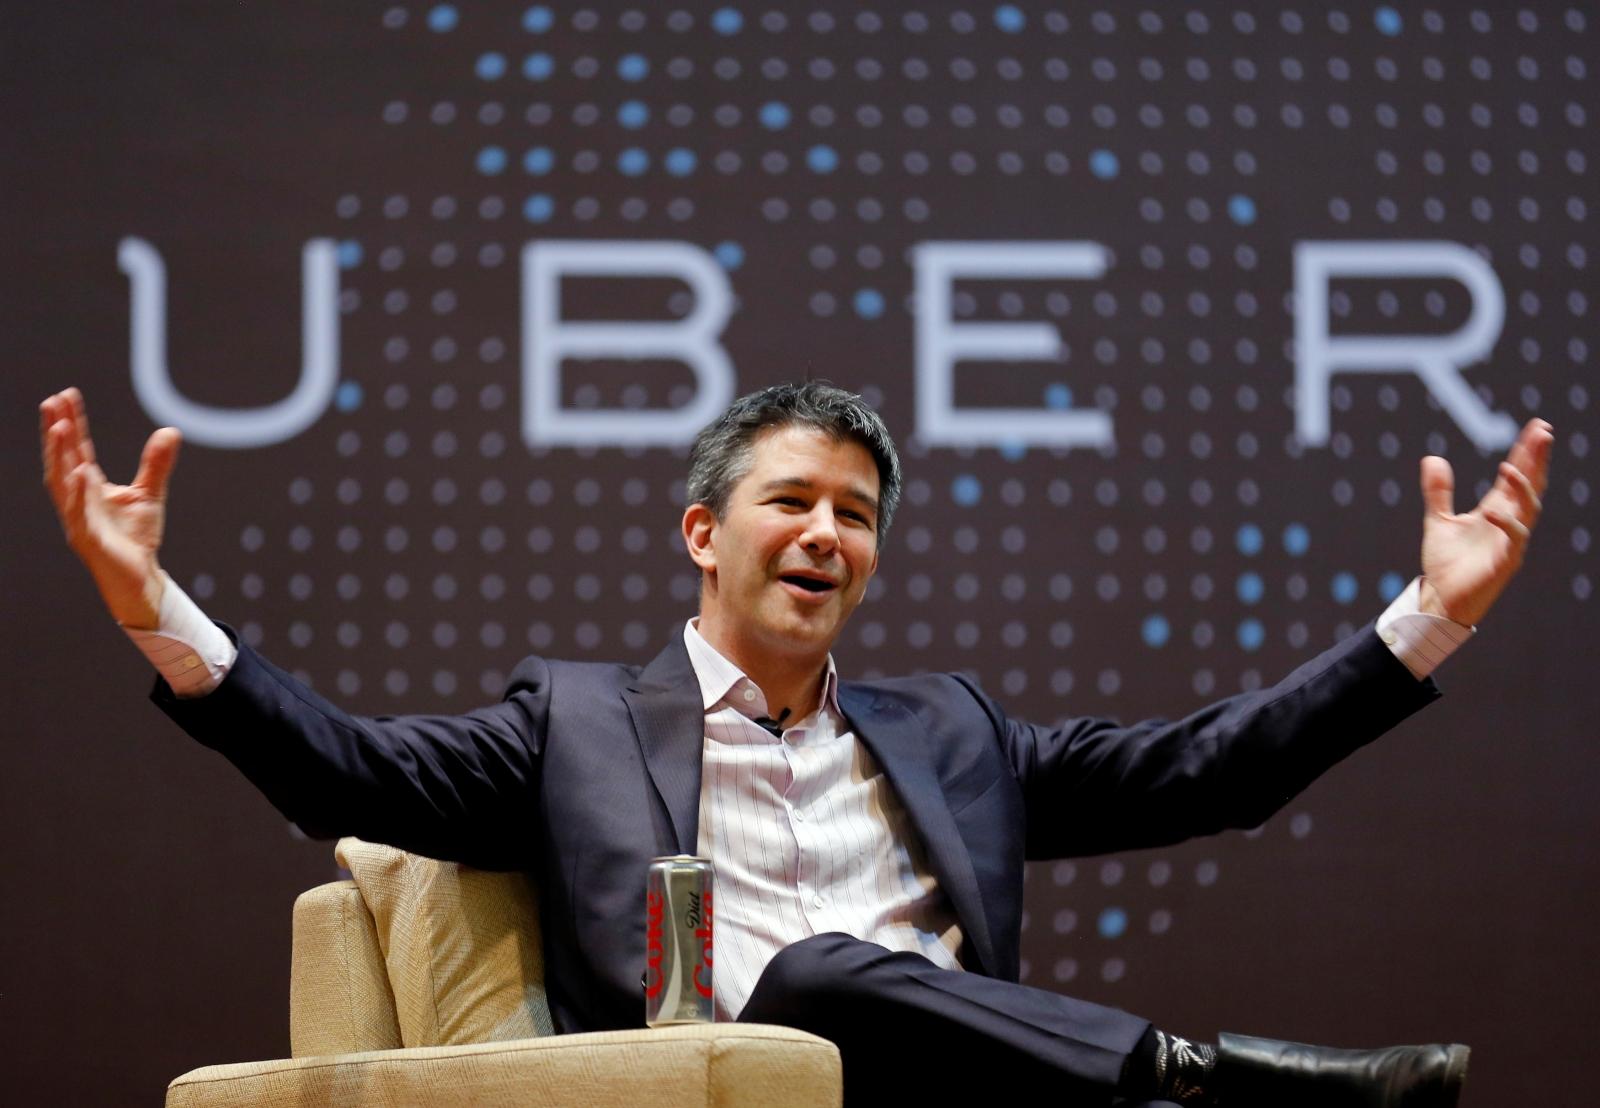 Uber co-founder Travis Kalanick